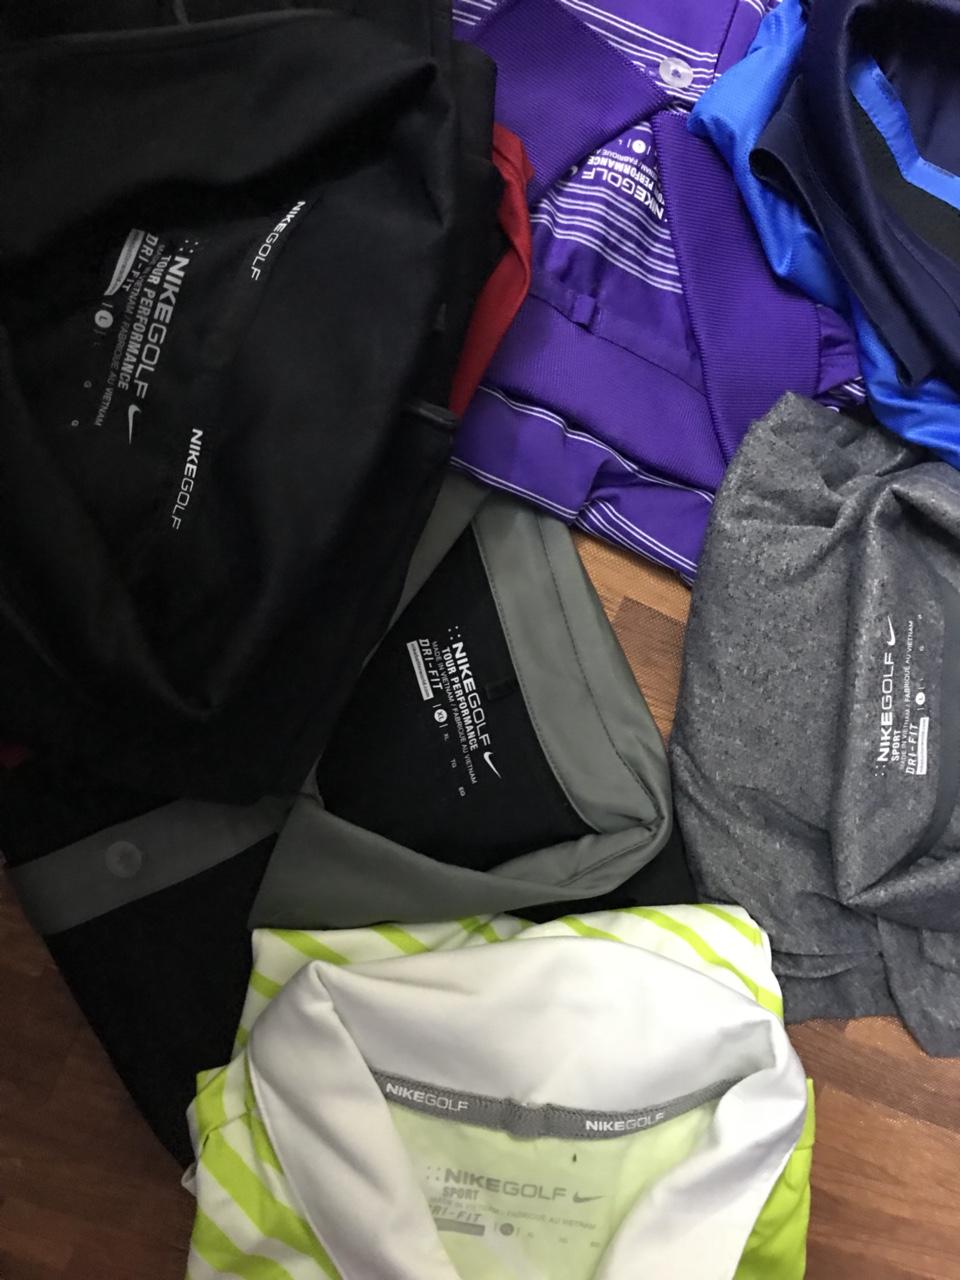 Áo thun NikeGolf bigsize MSP107 ( từ 90kg trở lên )